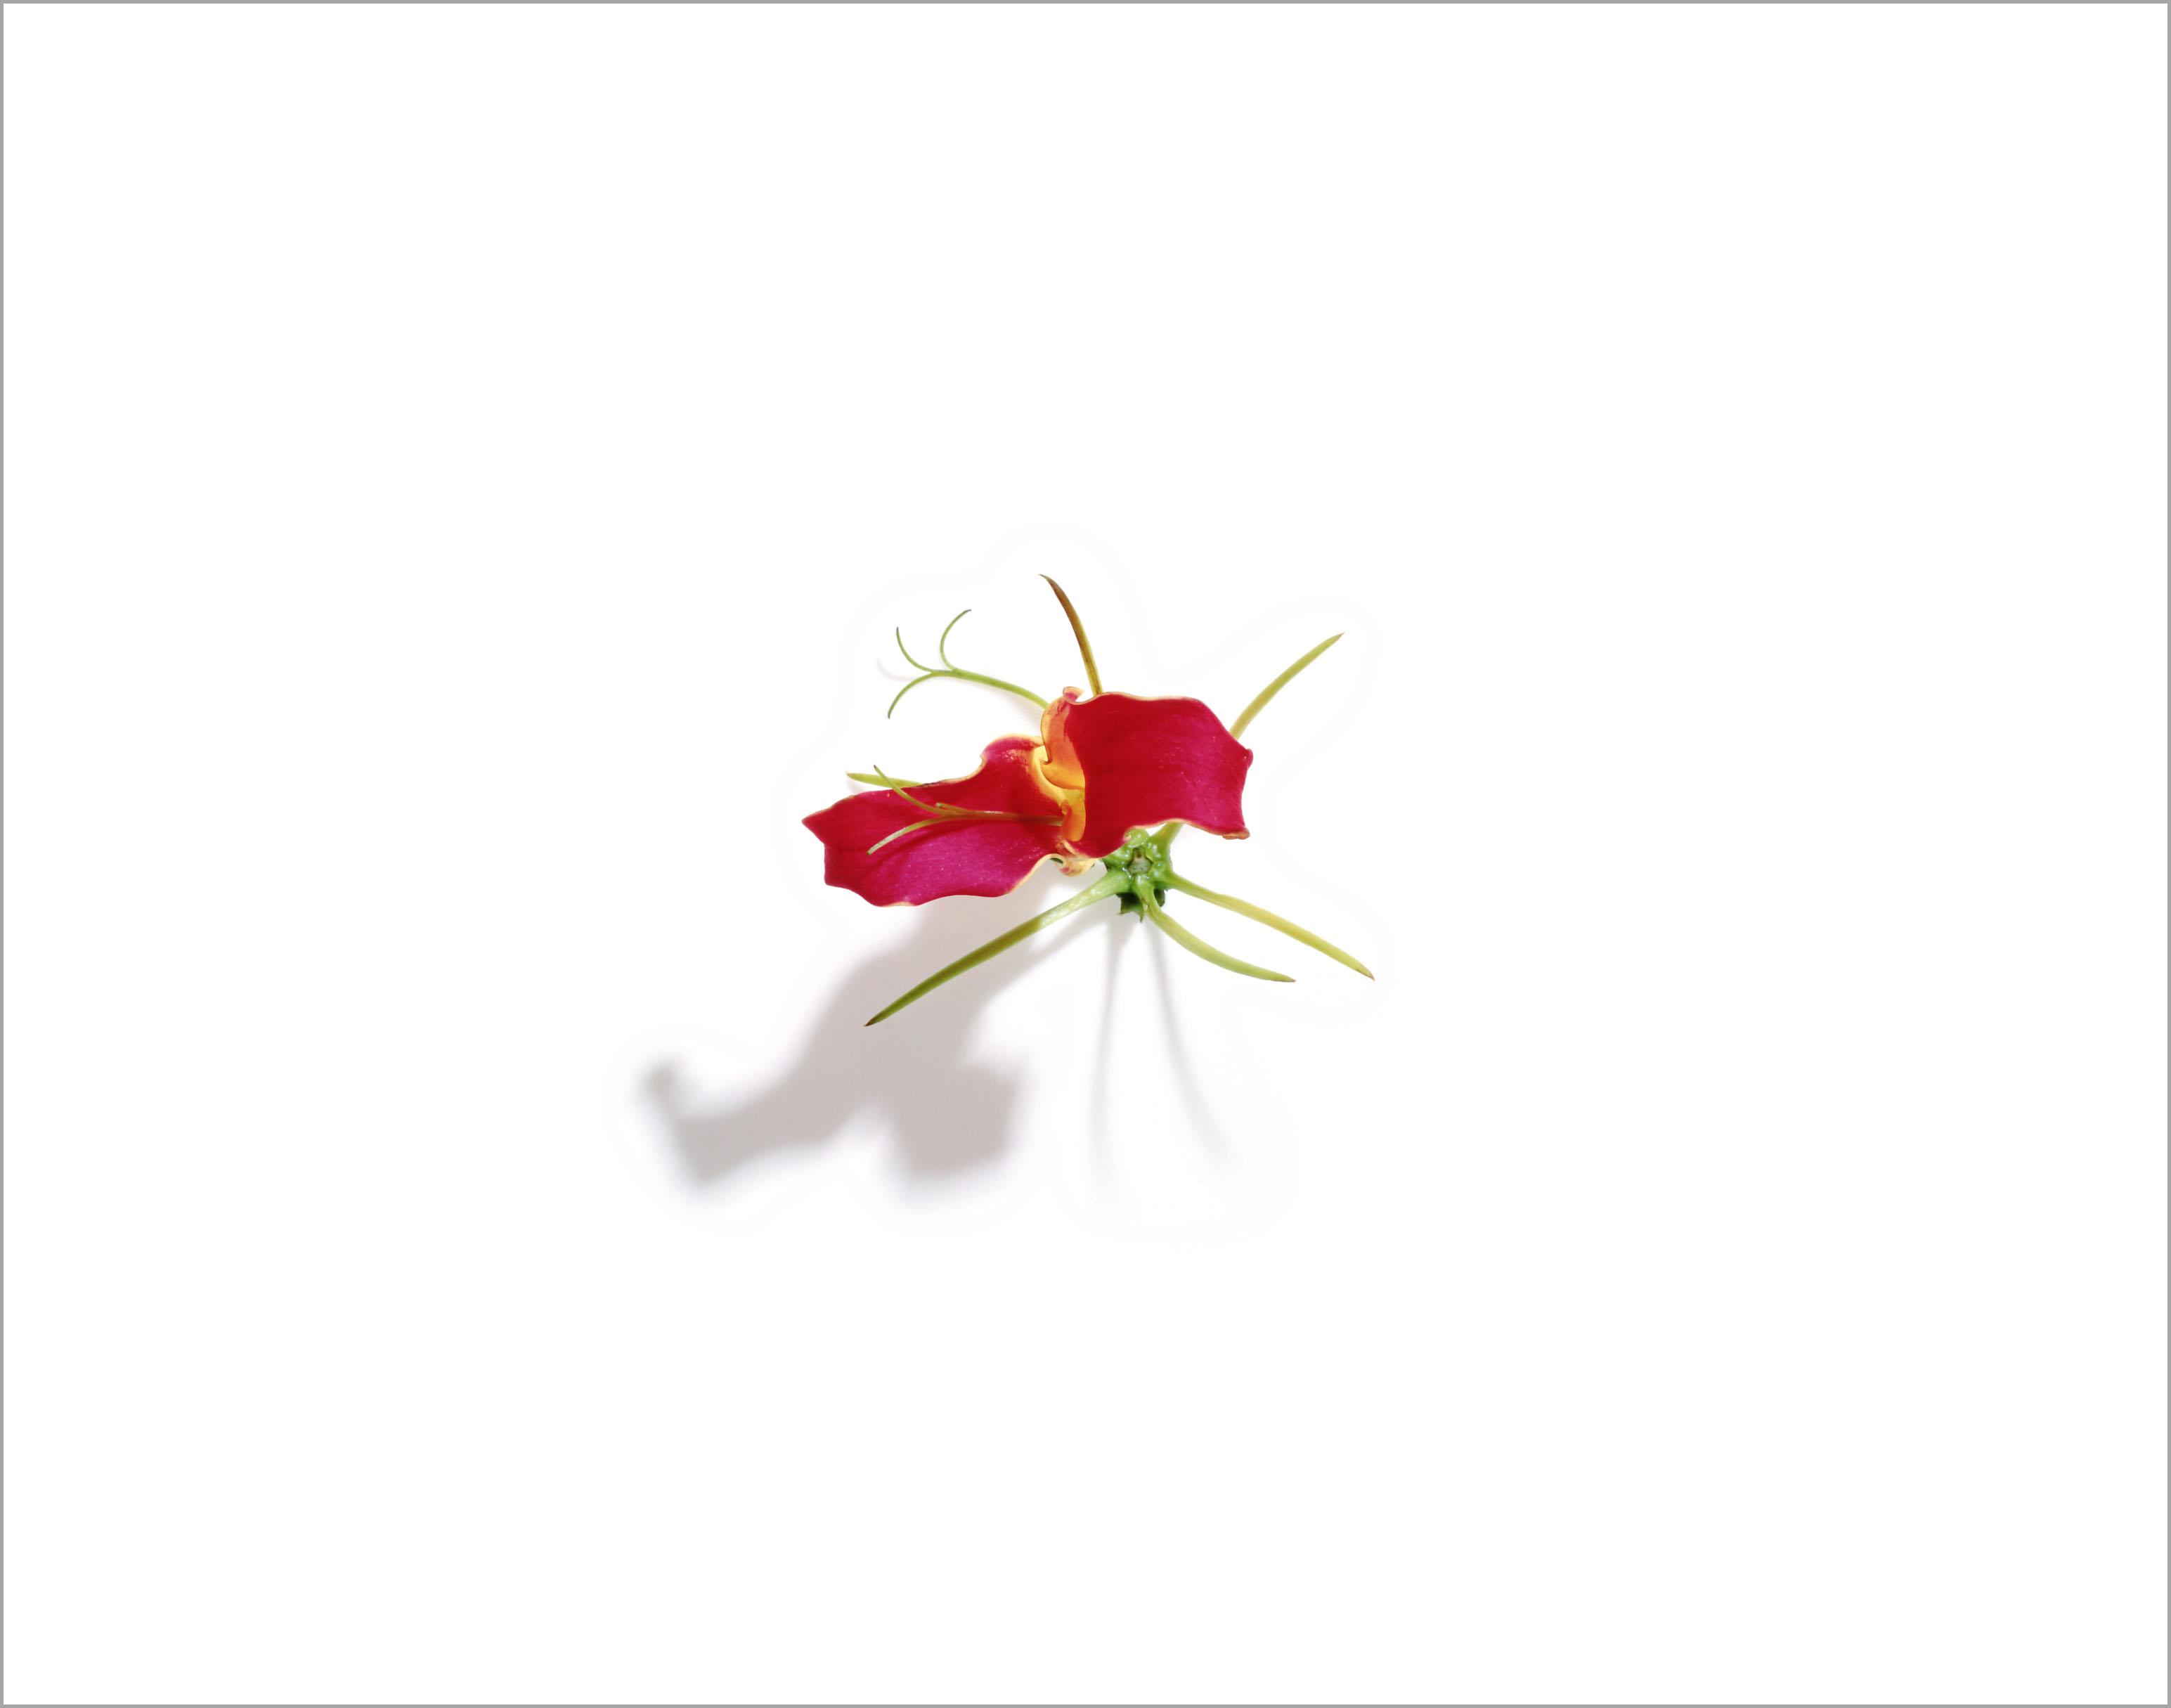 007_flora